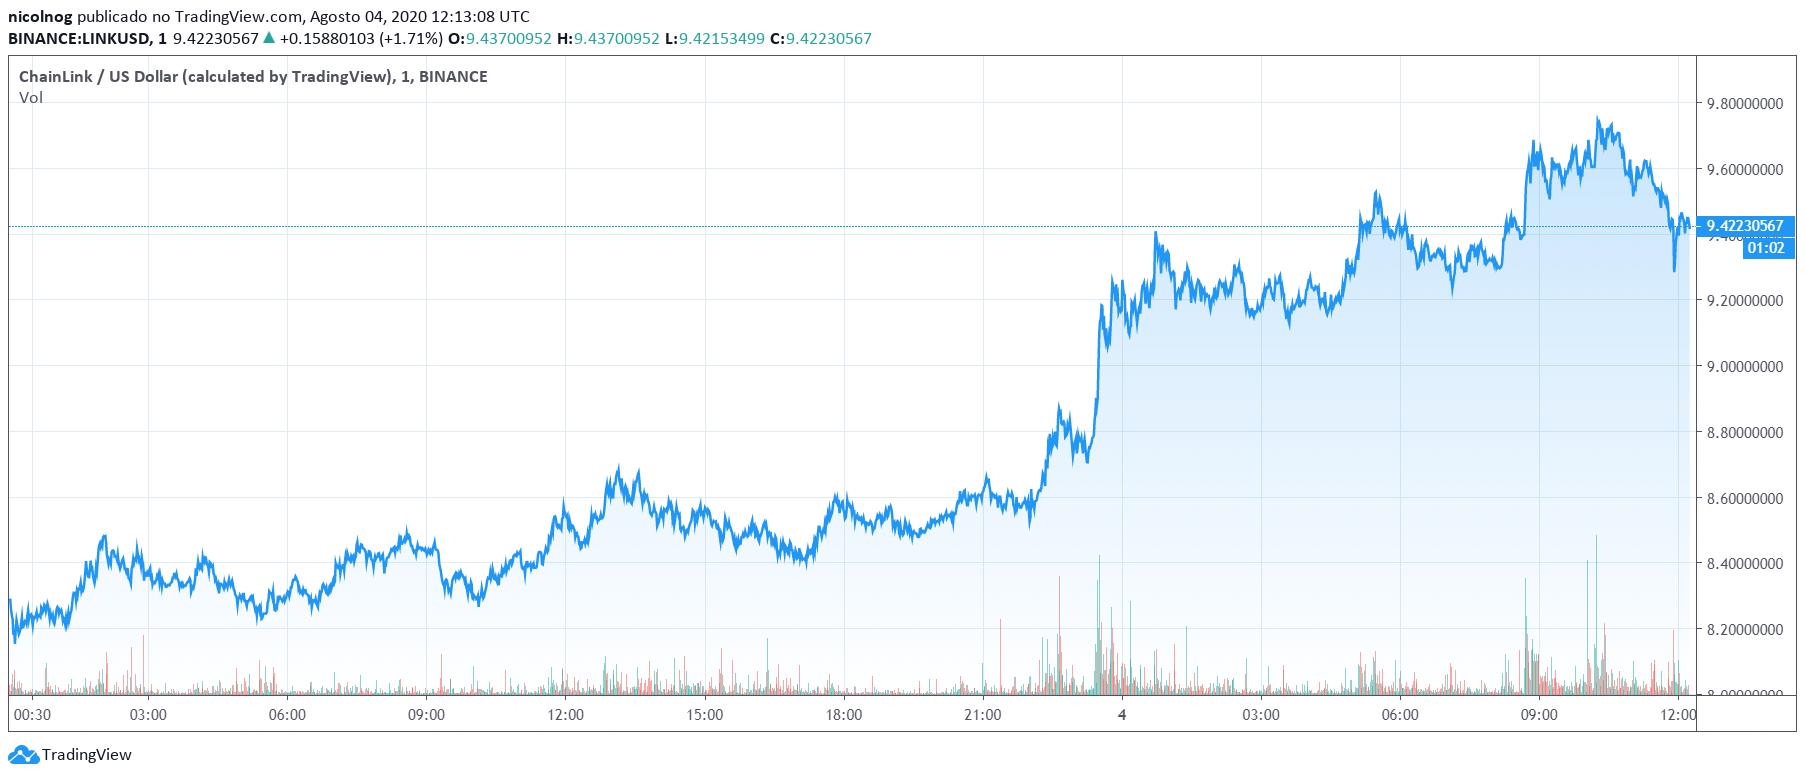 LINK vs. USD nas últimas 24 horas